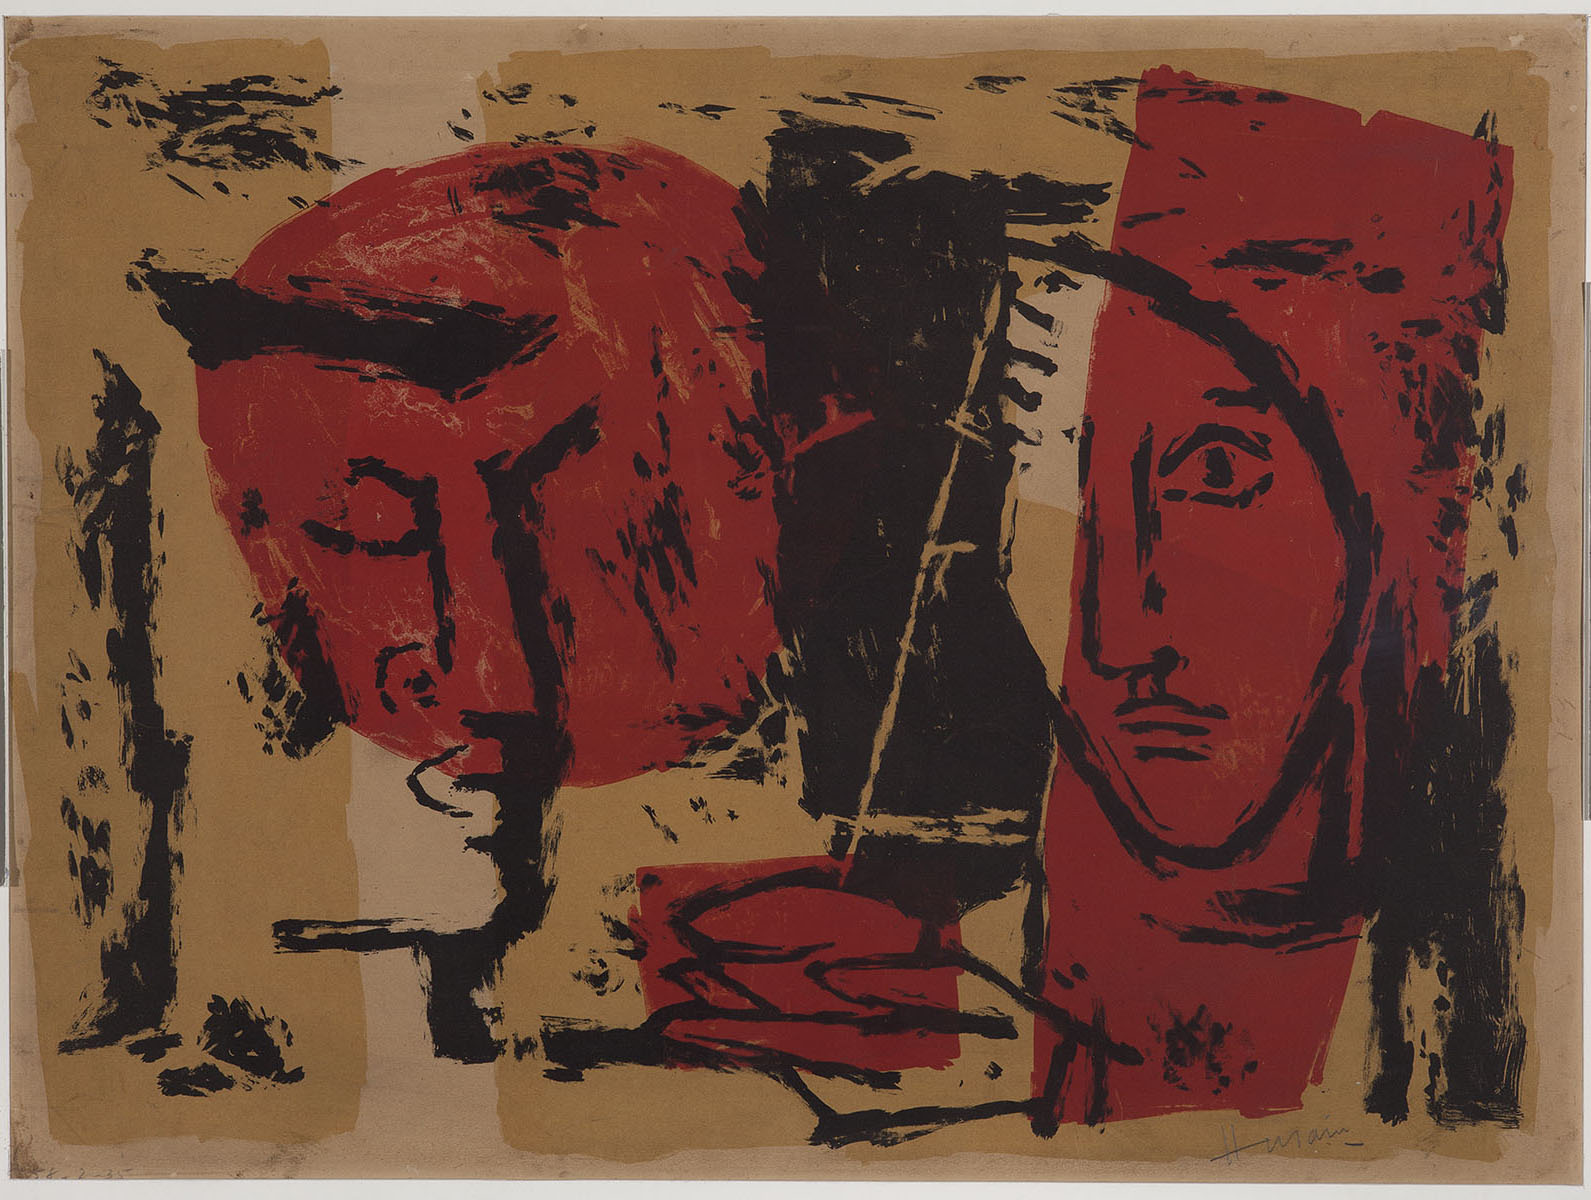 Untitled (1958)